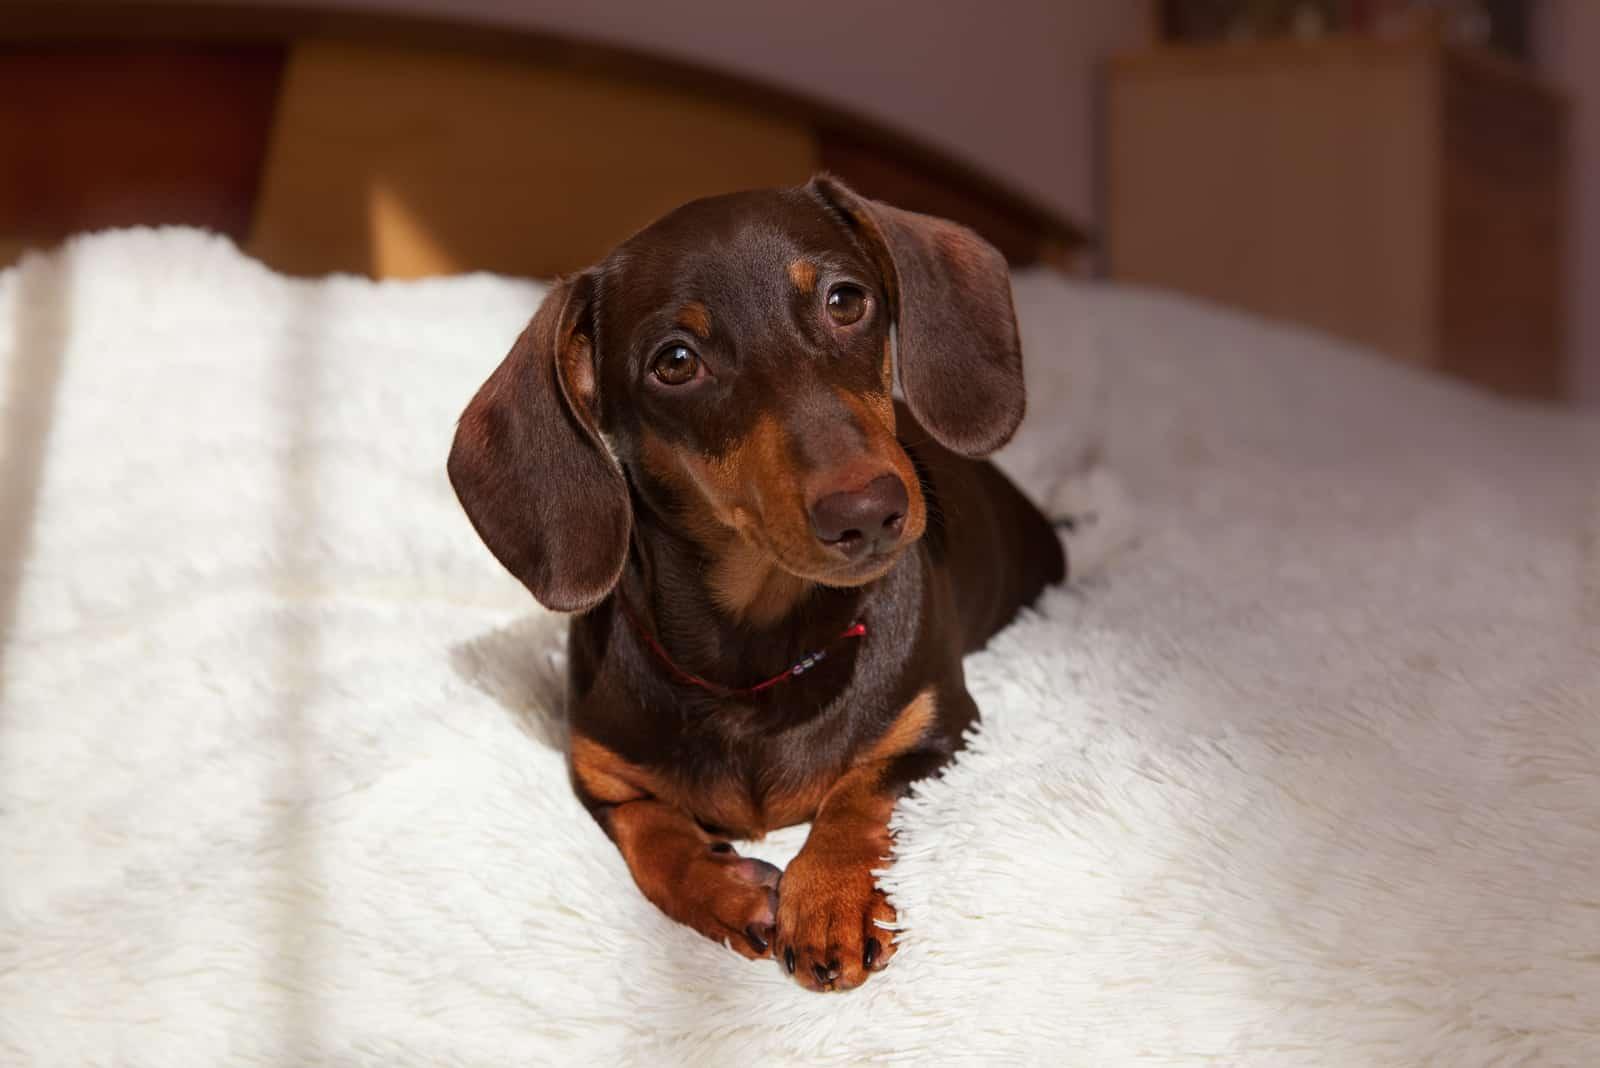 cute puppy of a chocolate dachshund lies on a light blanket